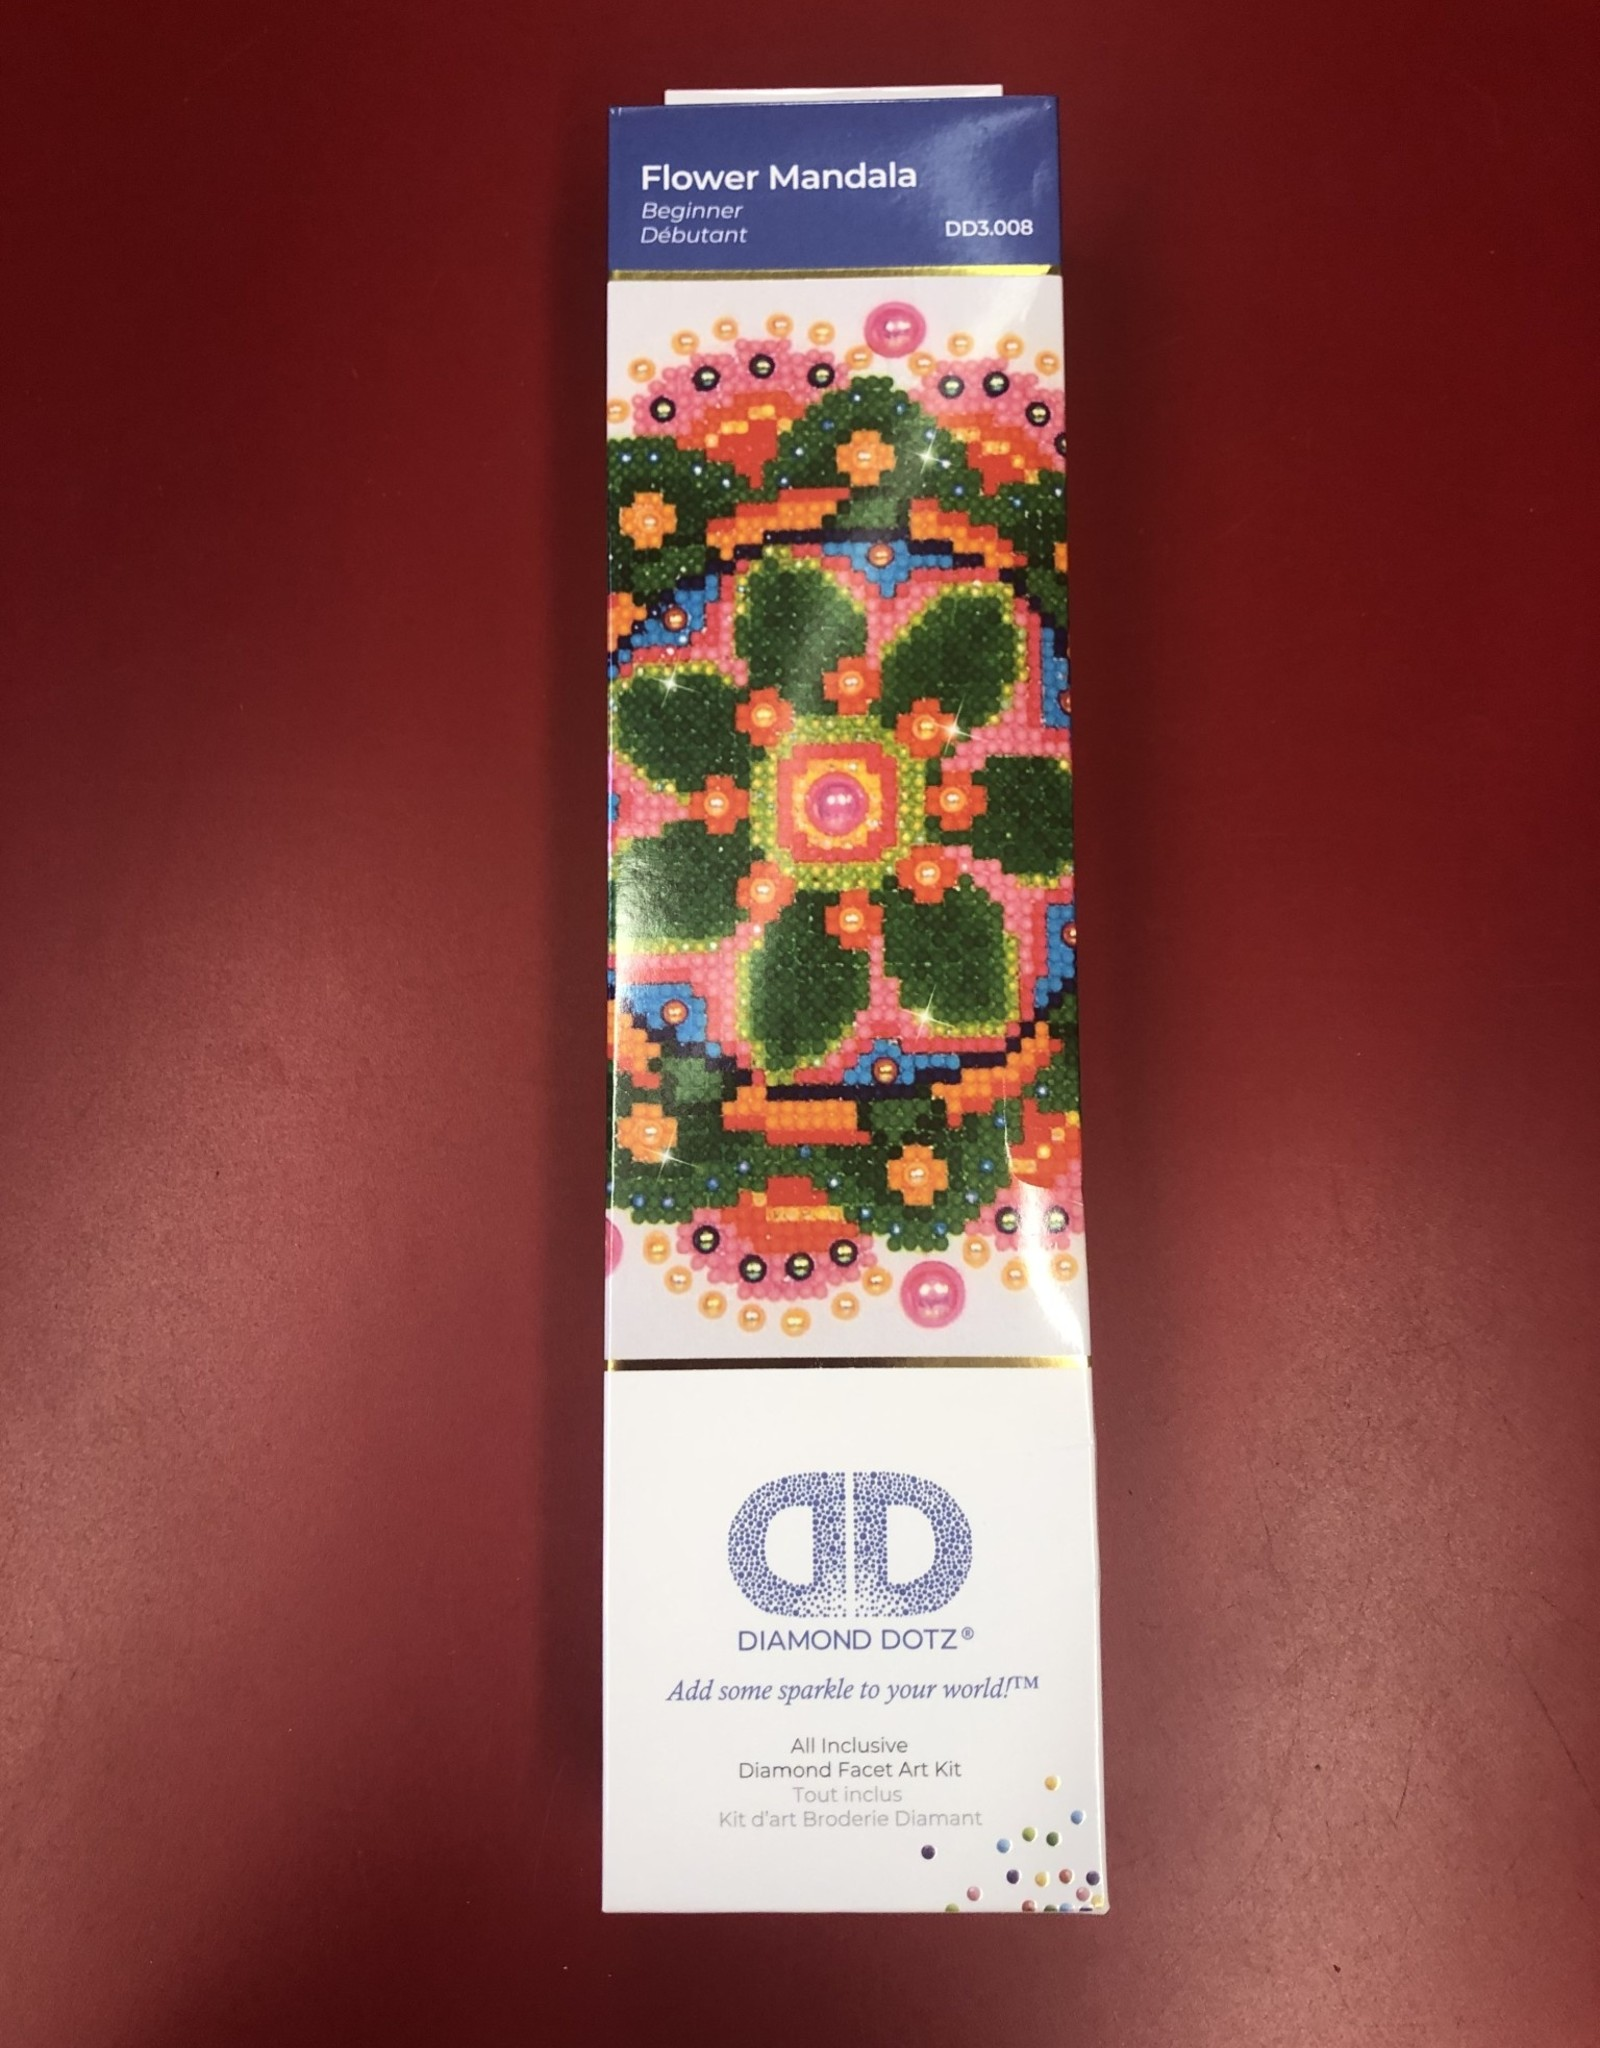 Diamond Dotz LTP Diamond Dotz - Flower Mandala